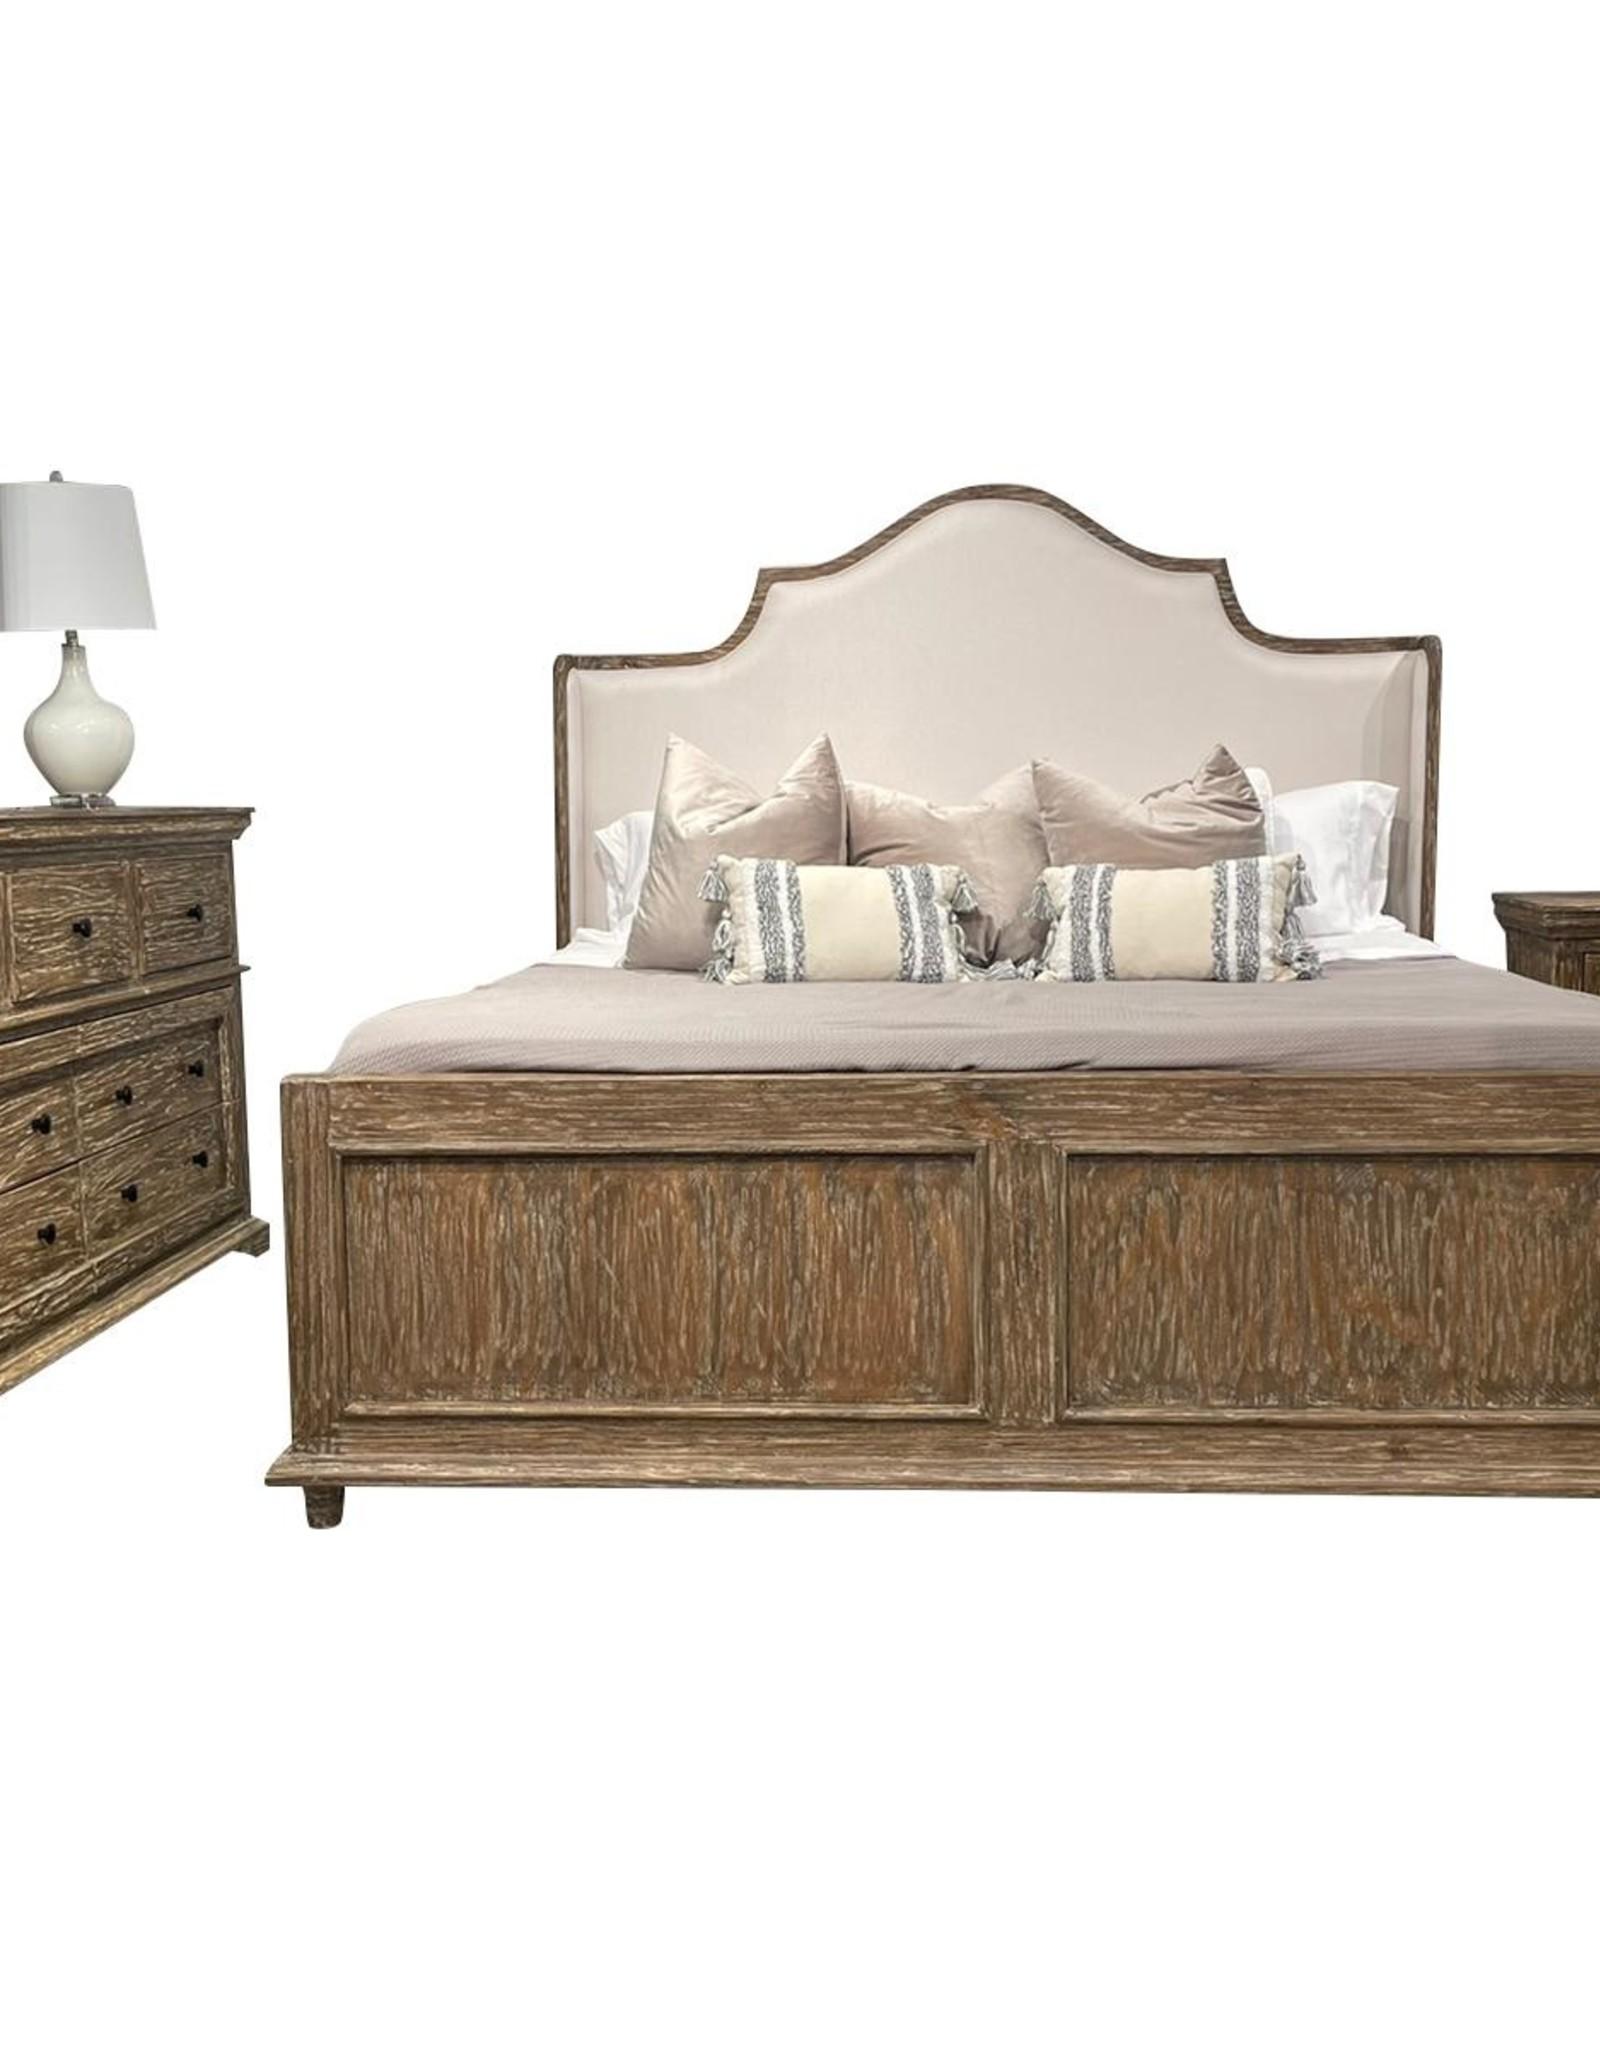 Vintage Furniture LLC Ambrosia Queen Bed,D,M,C,NS : Almond (Vintage)